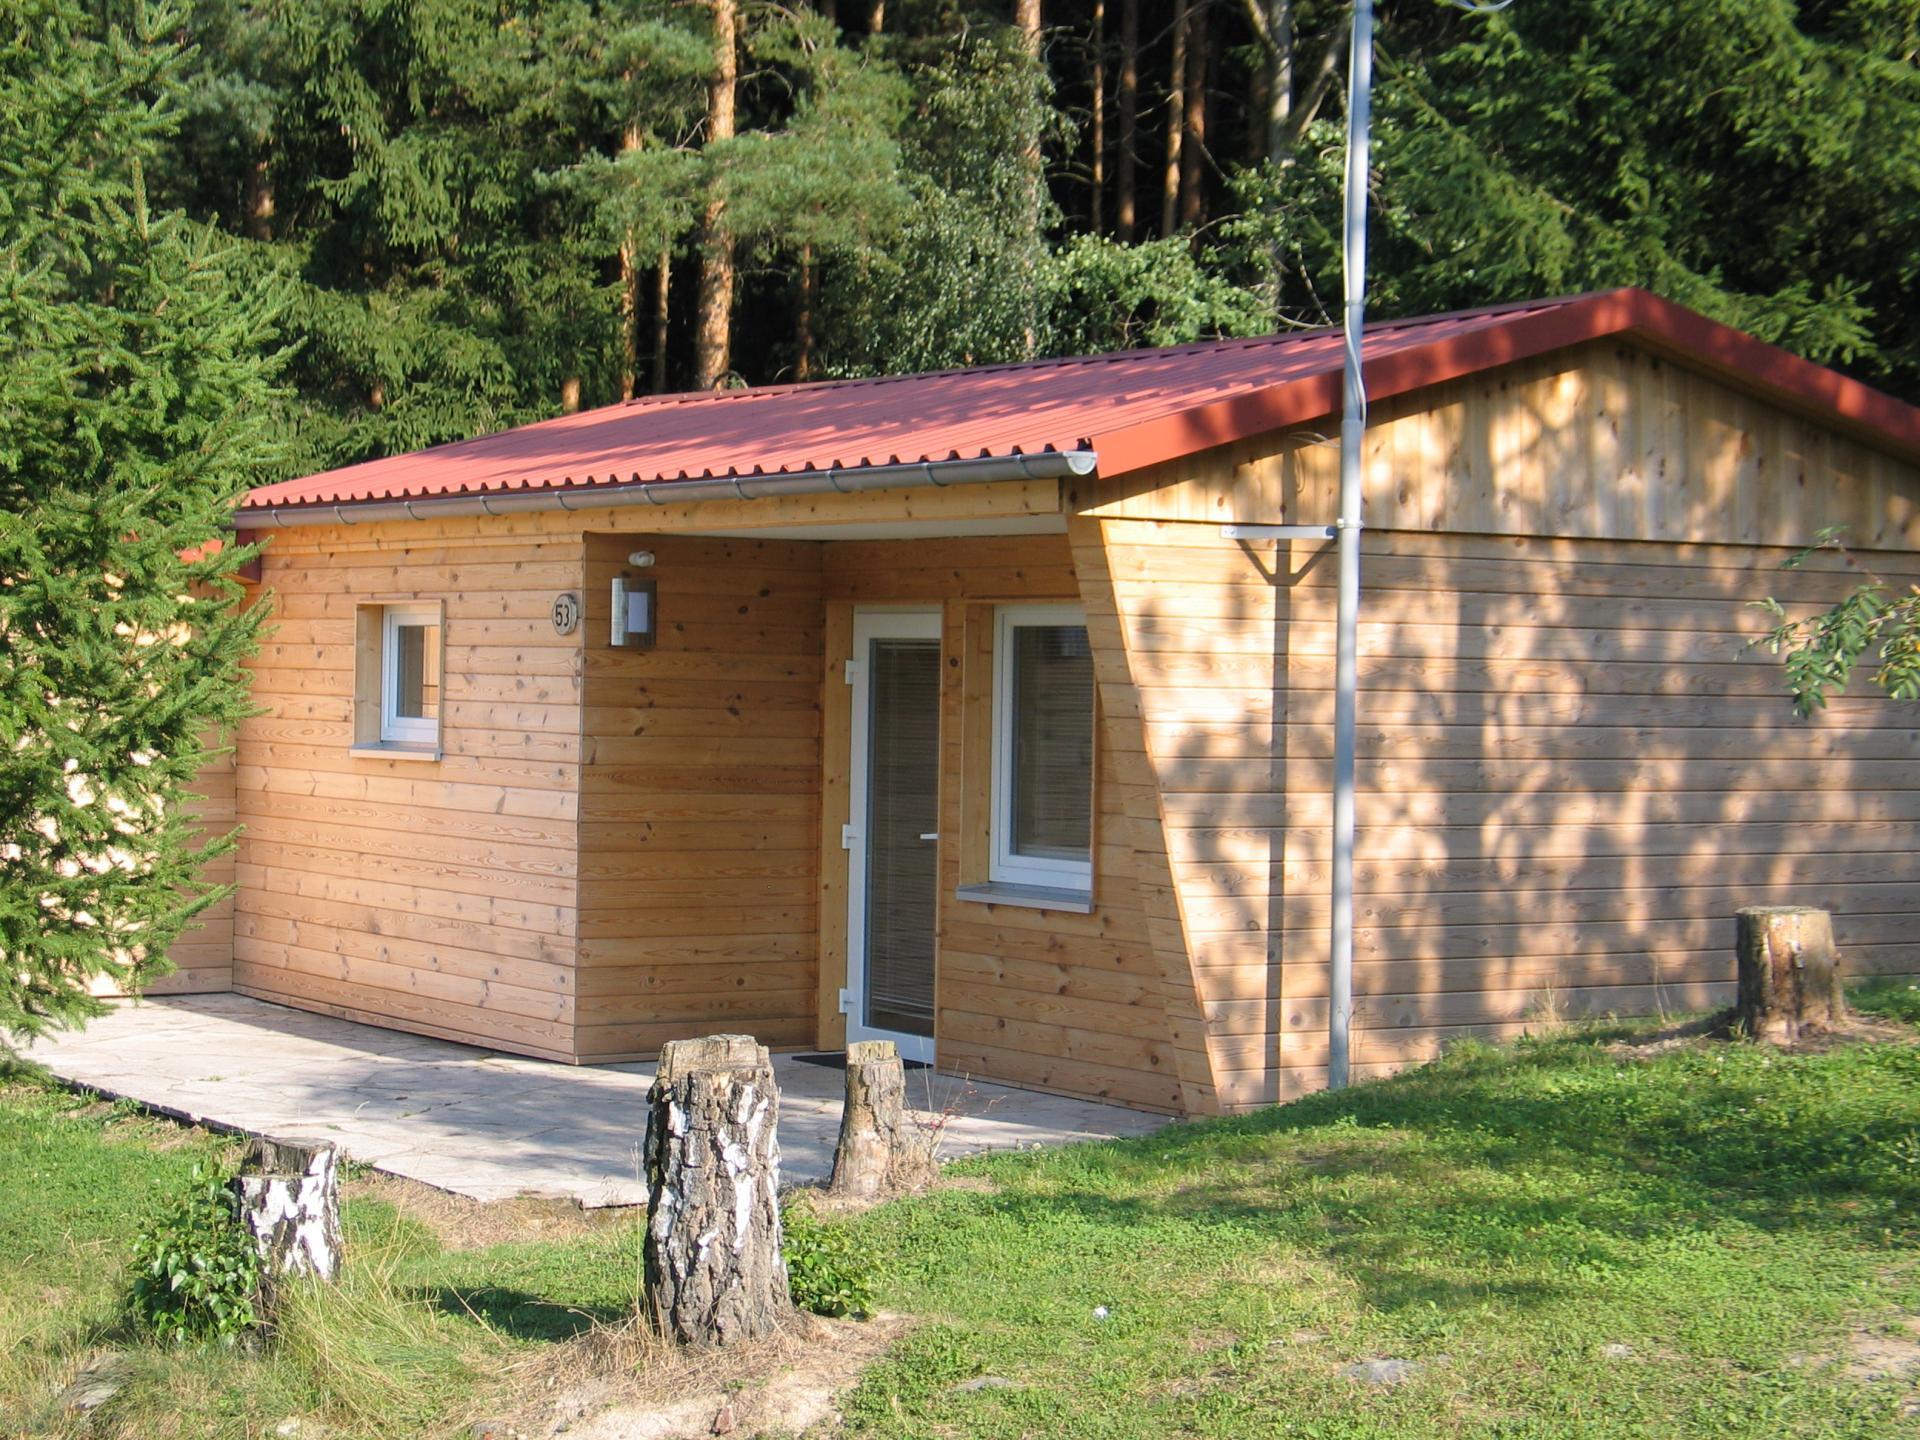 ferienhaus nordic campingplatz hohenfelden. Black Bedroom Furniture Sets. Home Design Ideas